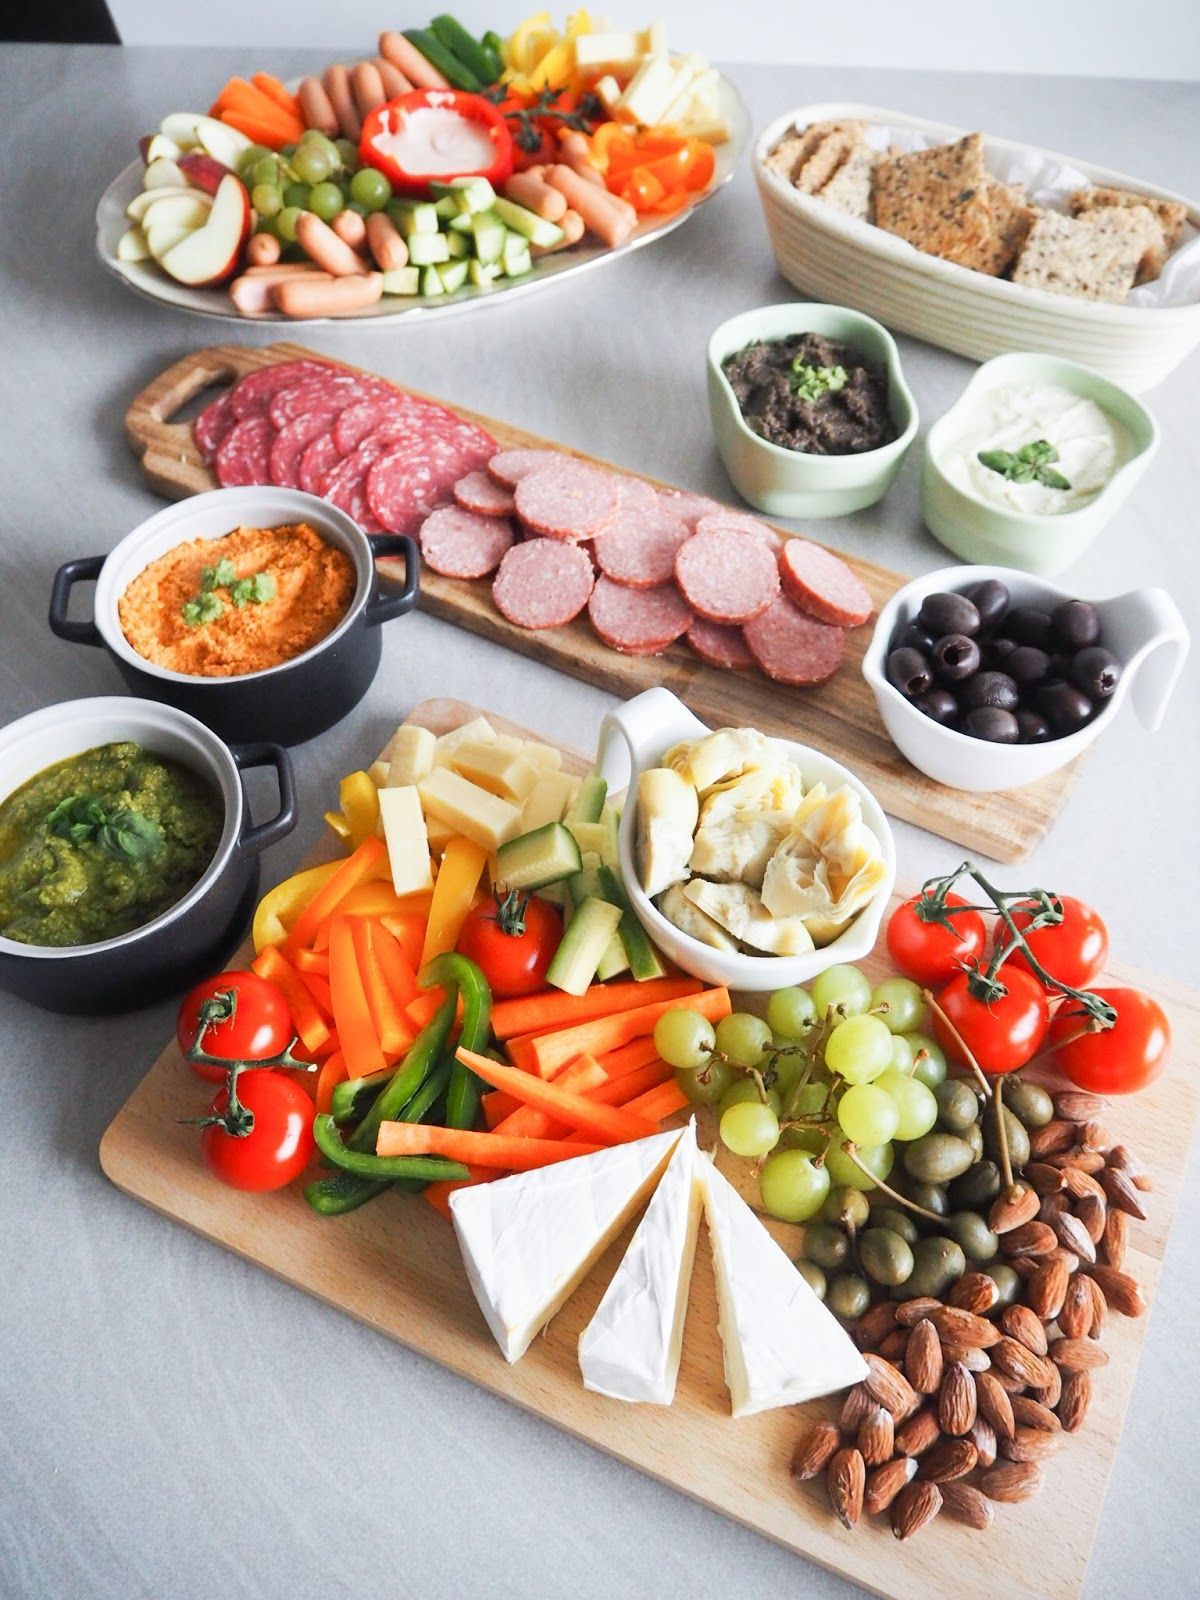 Lækker tapas - lav dit eget tapasbord - Home by Bianca #tapasideer